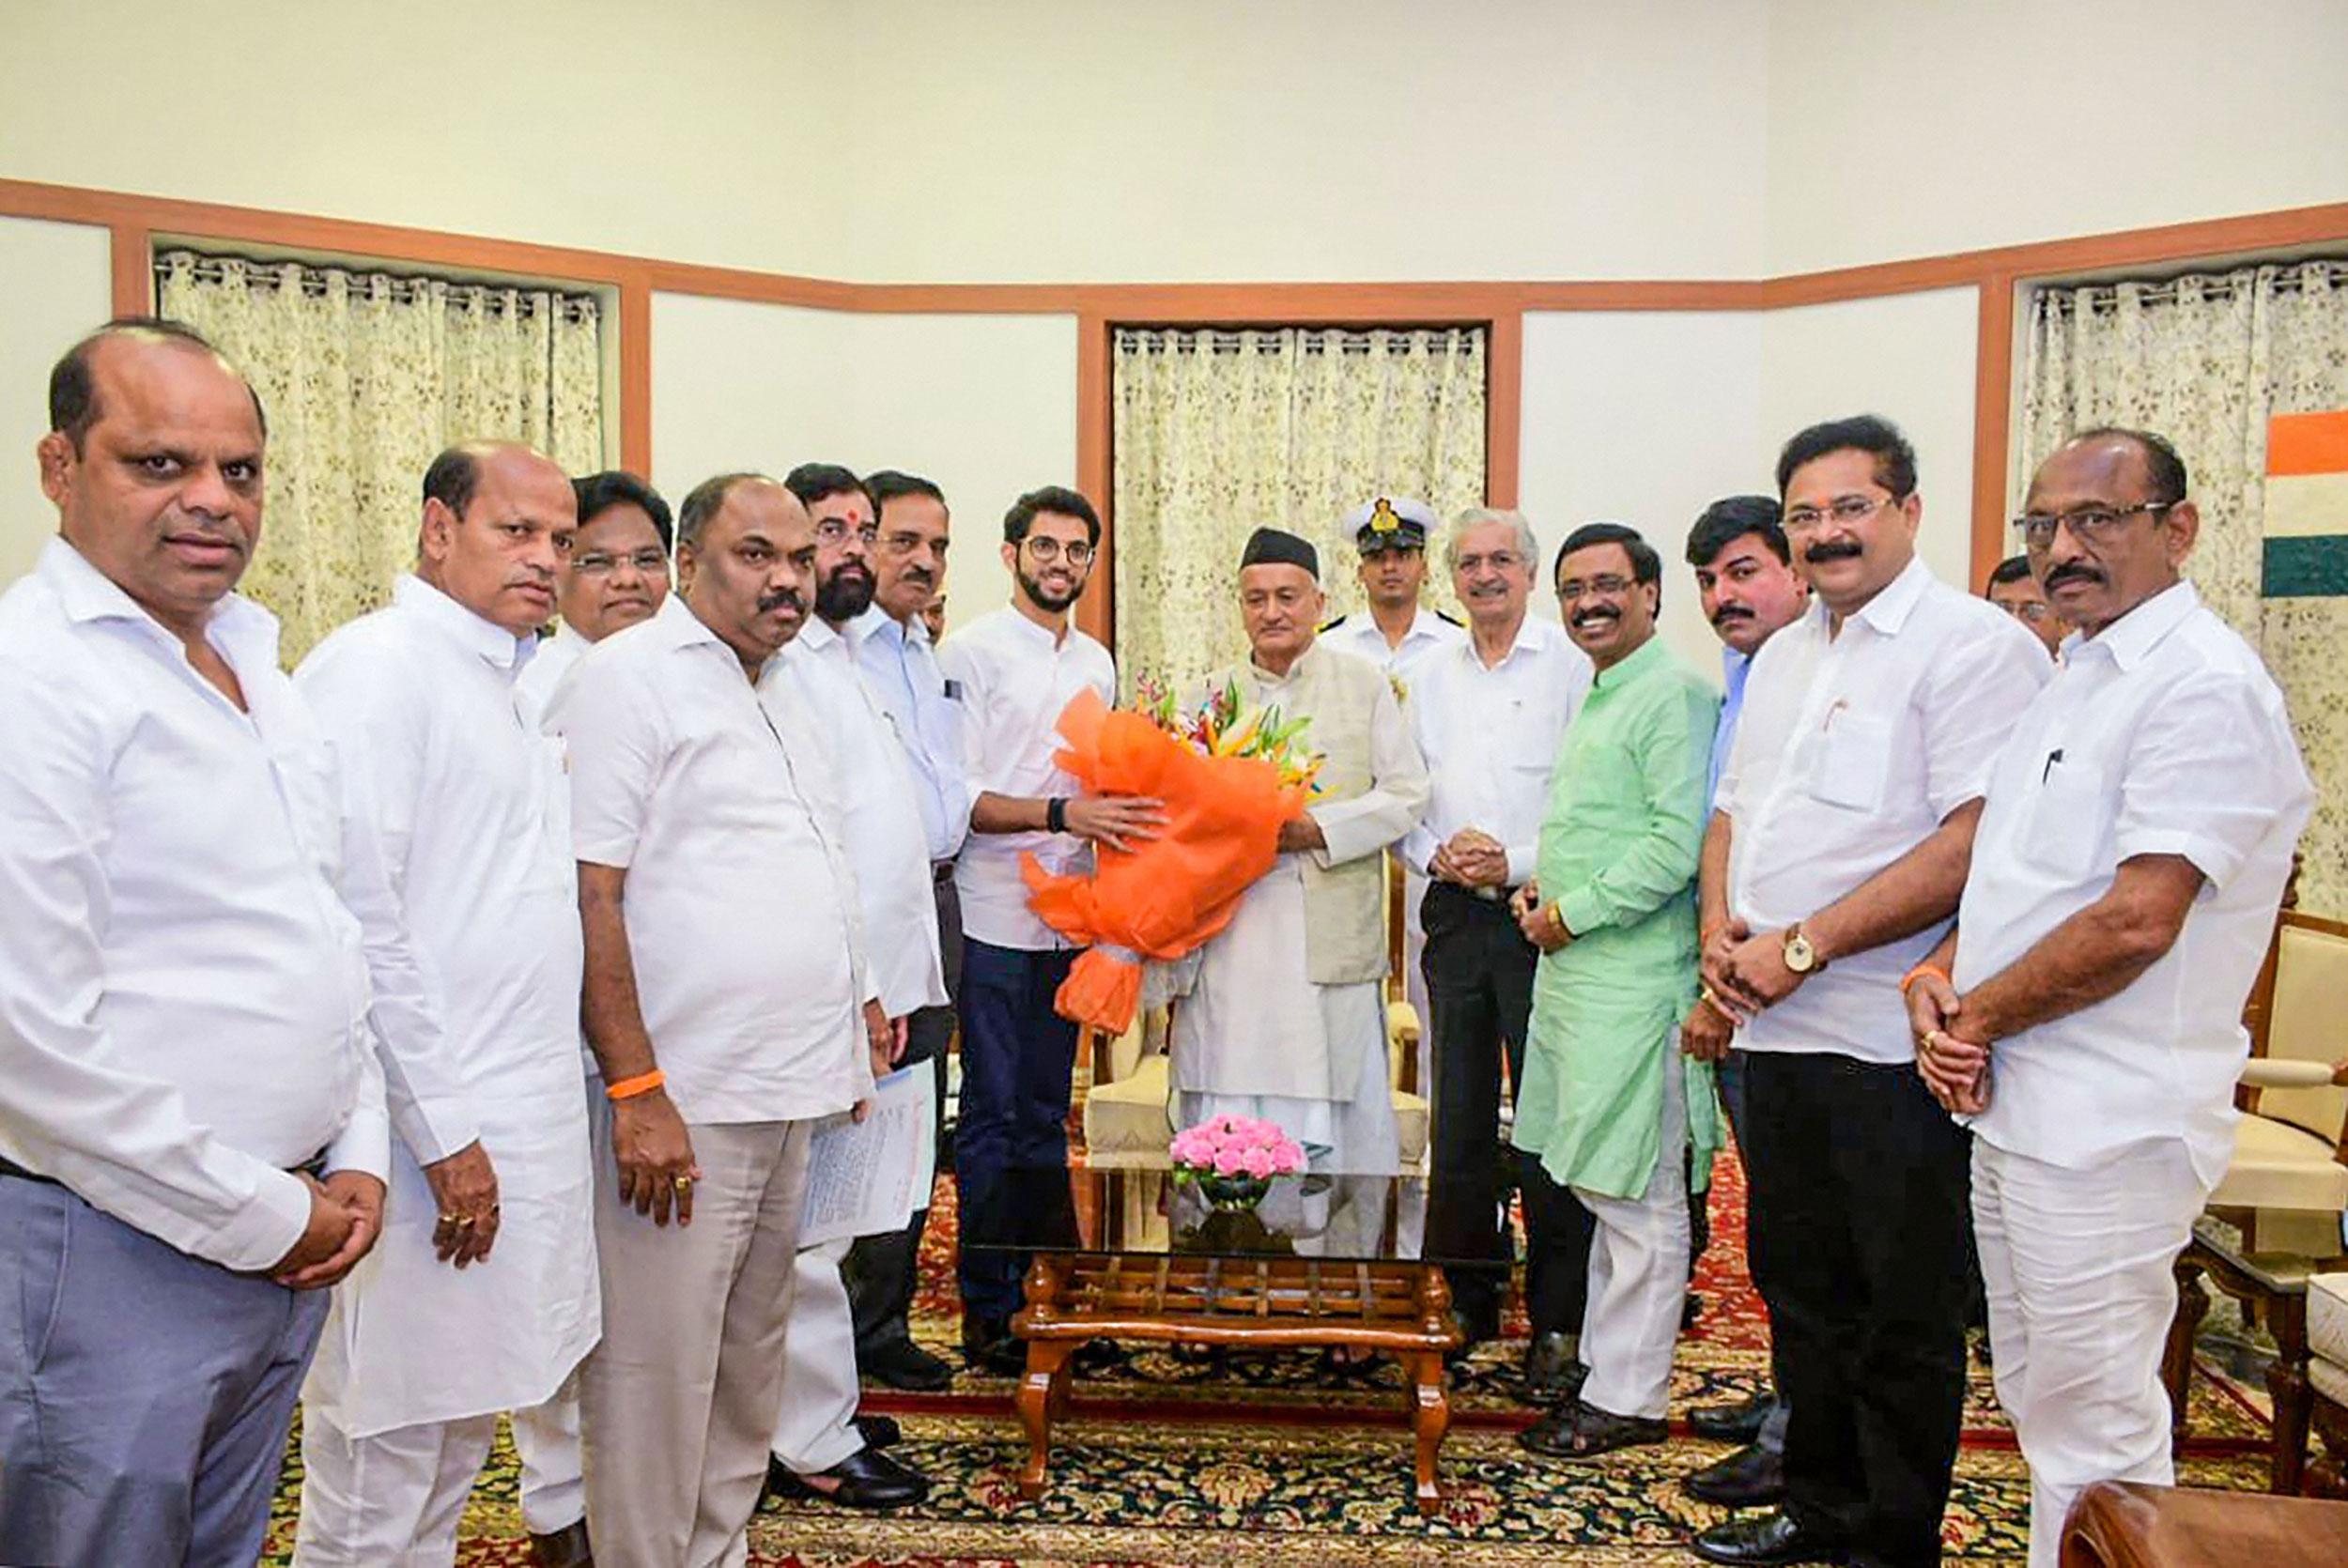 Shiv Sena leaders Aaditya Thackeray, Eknath Shinde and others meet Maharashtra governor Bhagat Singh Koshyari at Raj Bhavan in Mumbai on November 11, 2019. The Shiv Sena has been critical of Koshyari for his refusal to grant the party 48 hours to gather the numbers in its kitty.